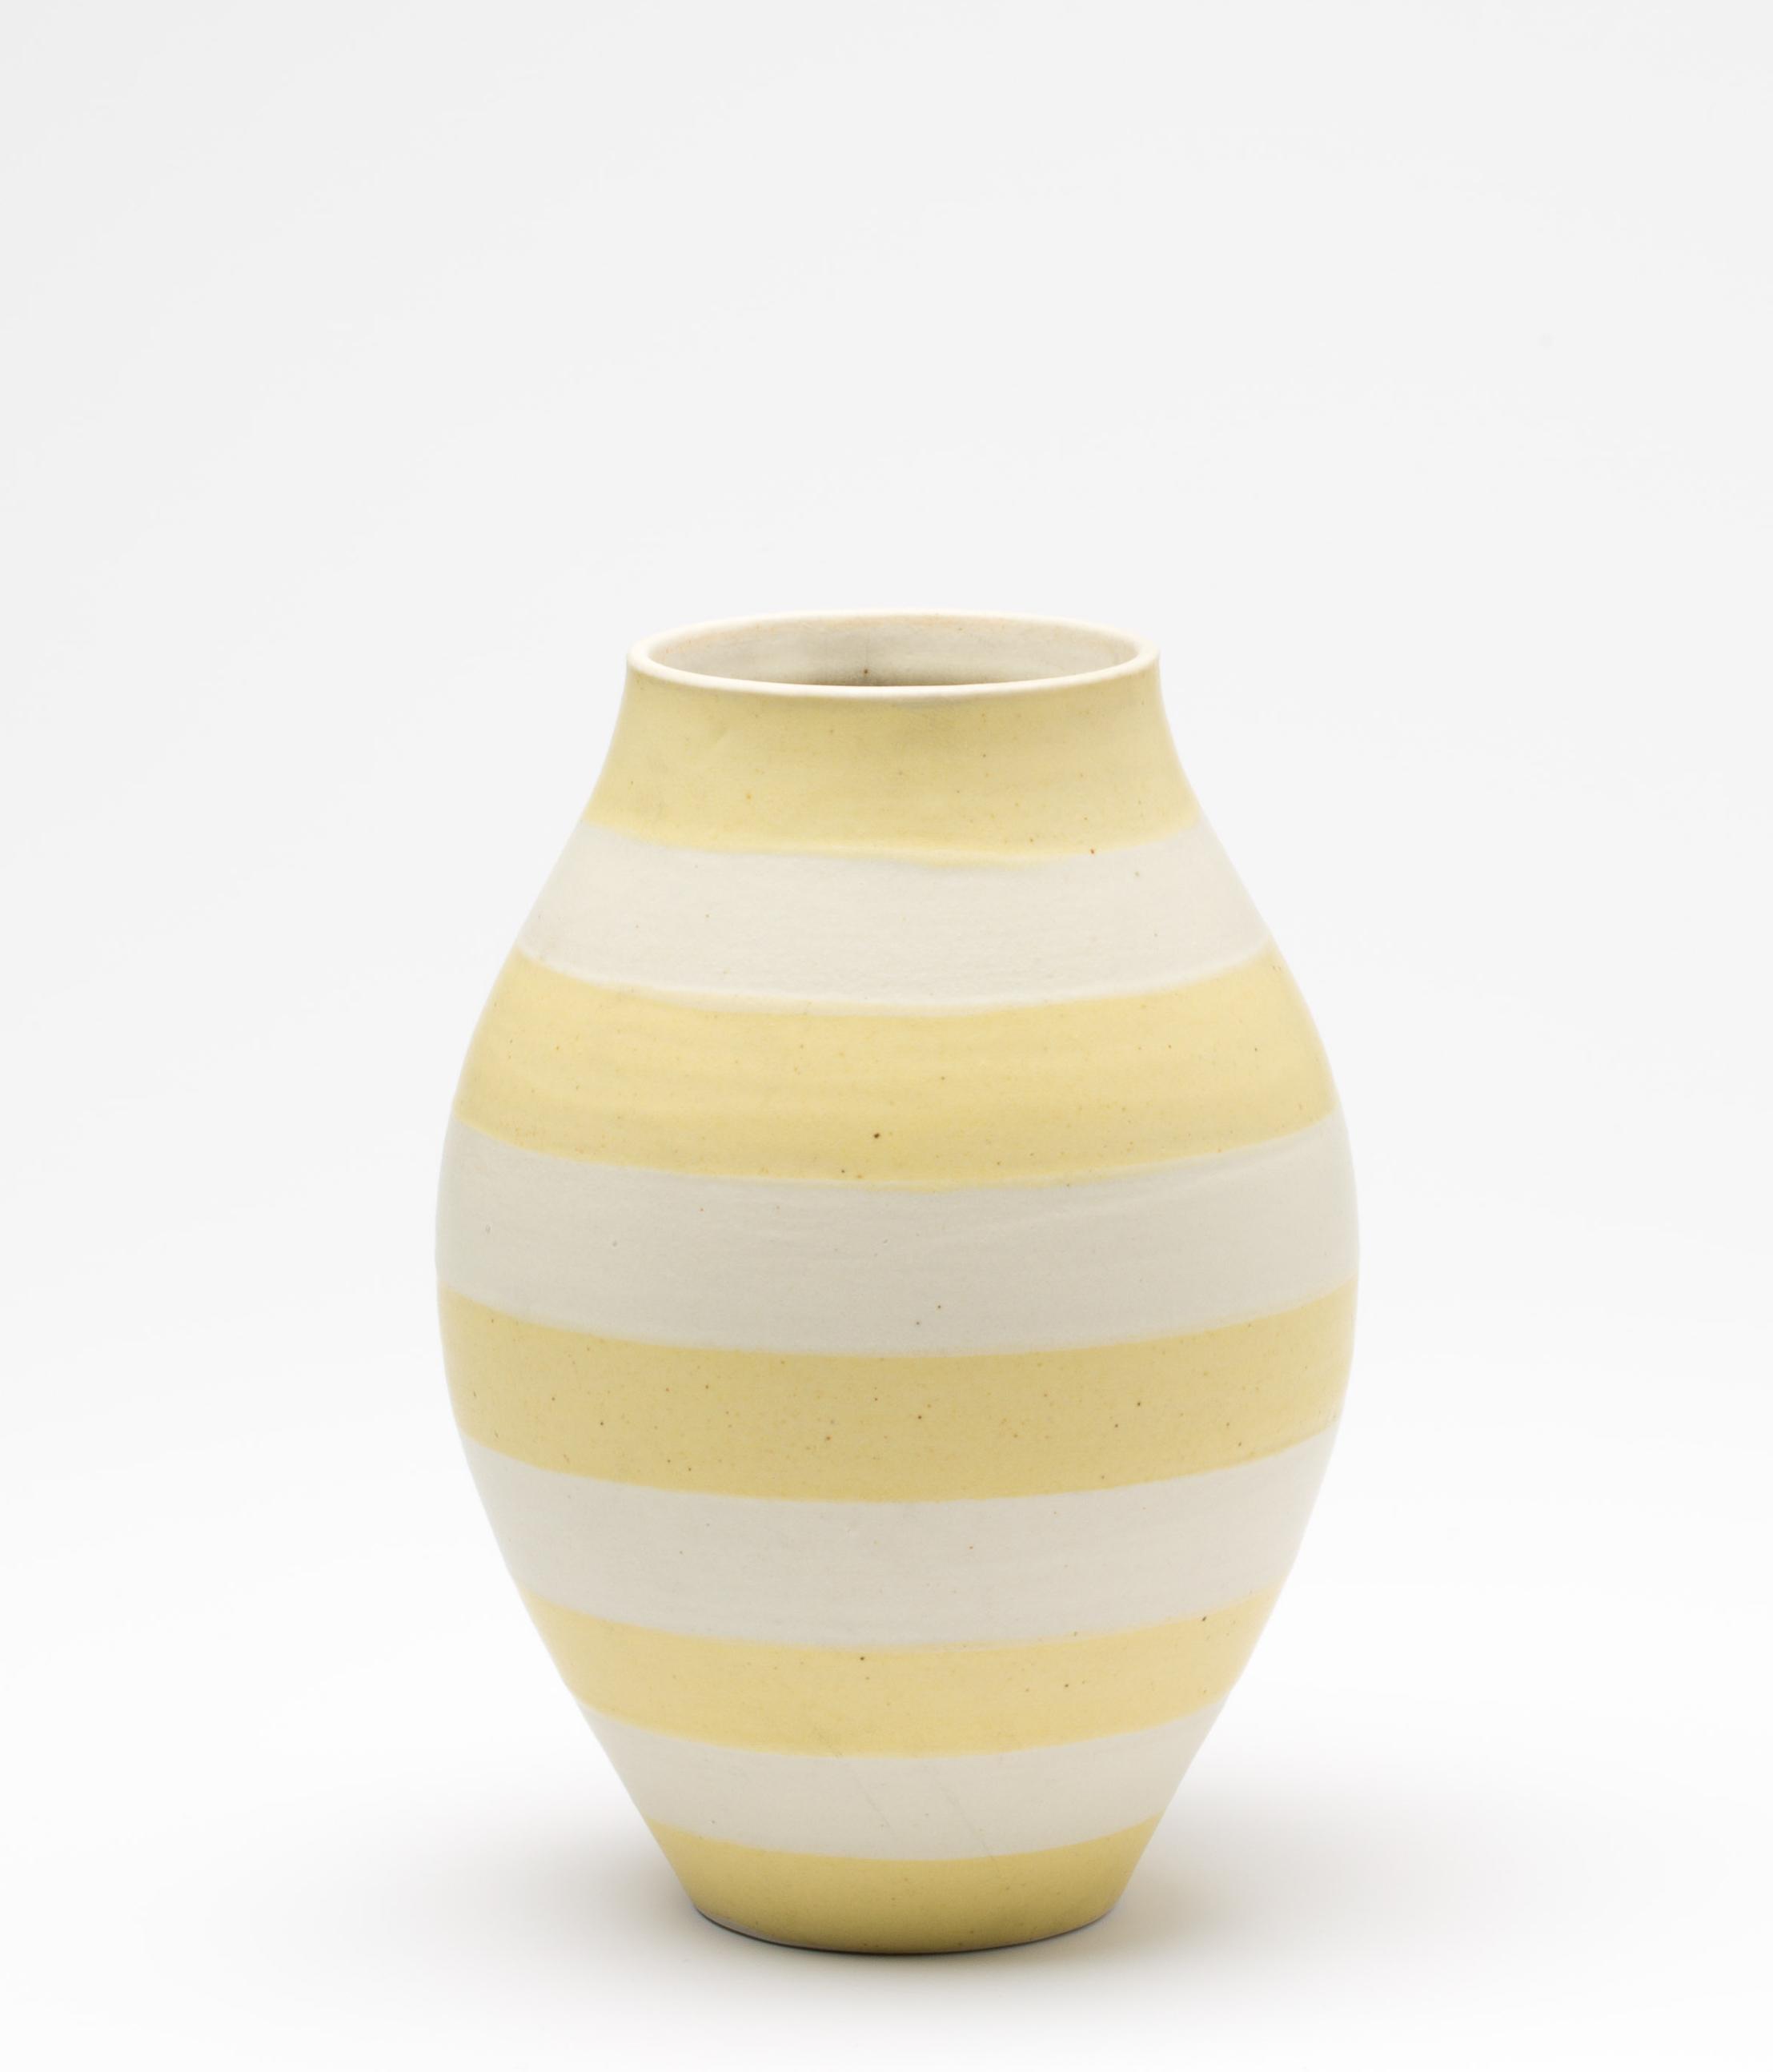 "Striped Vase  Cone 10 Oxidation Porcelain  5"" W x 7"" H  2016"